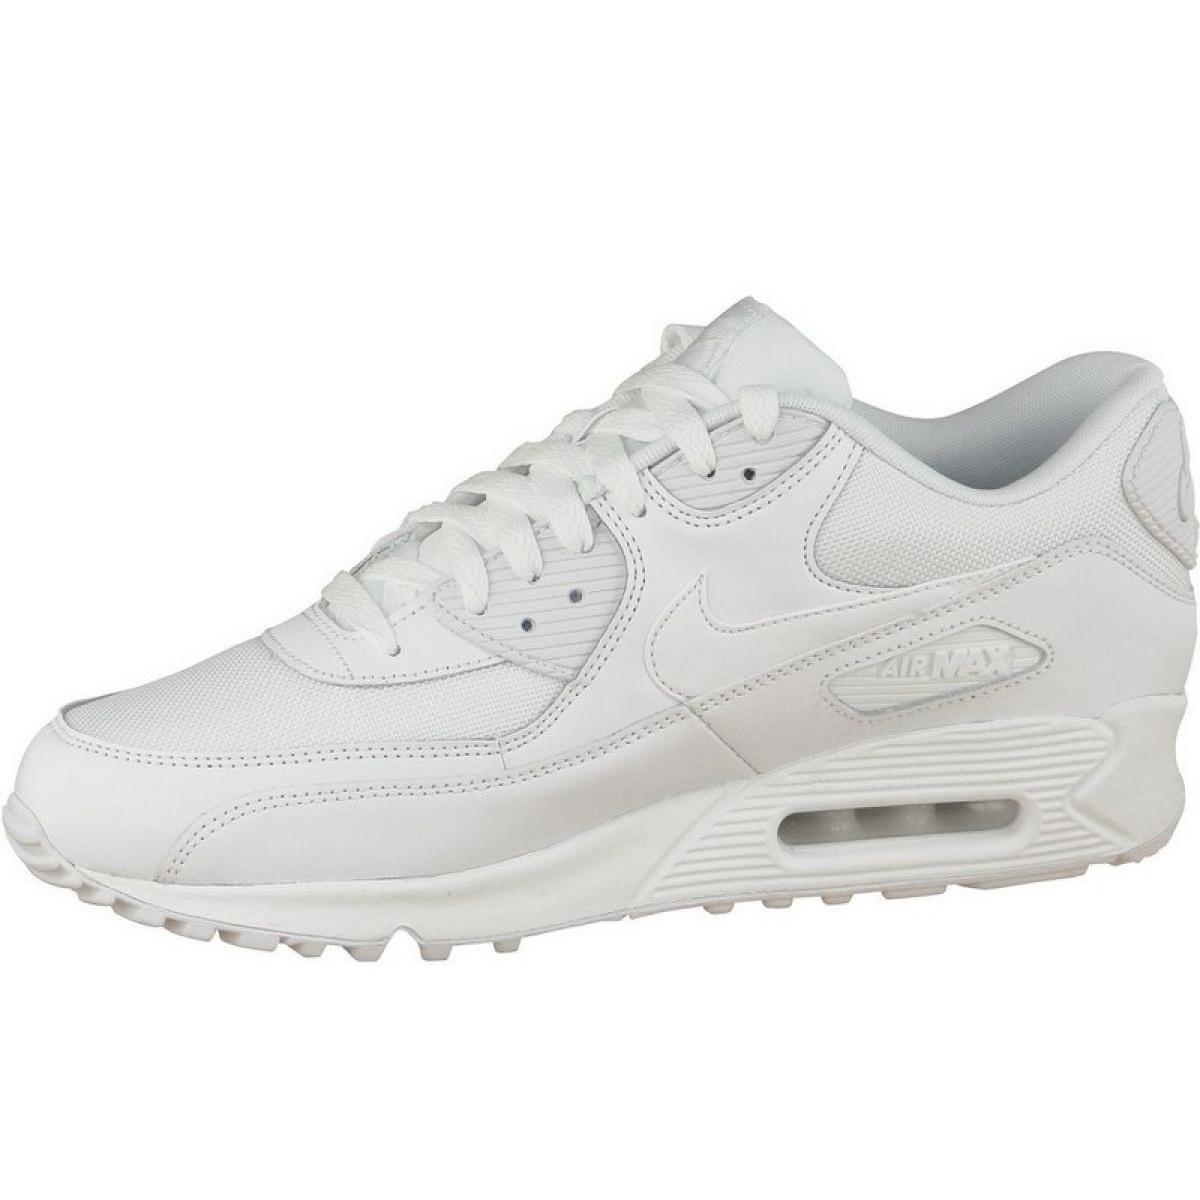 Nike Air Max 90 Essential 111 białe ButyModne.pl